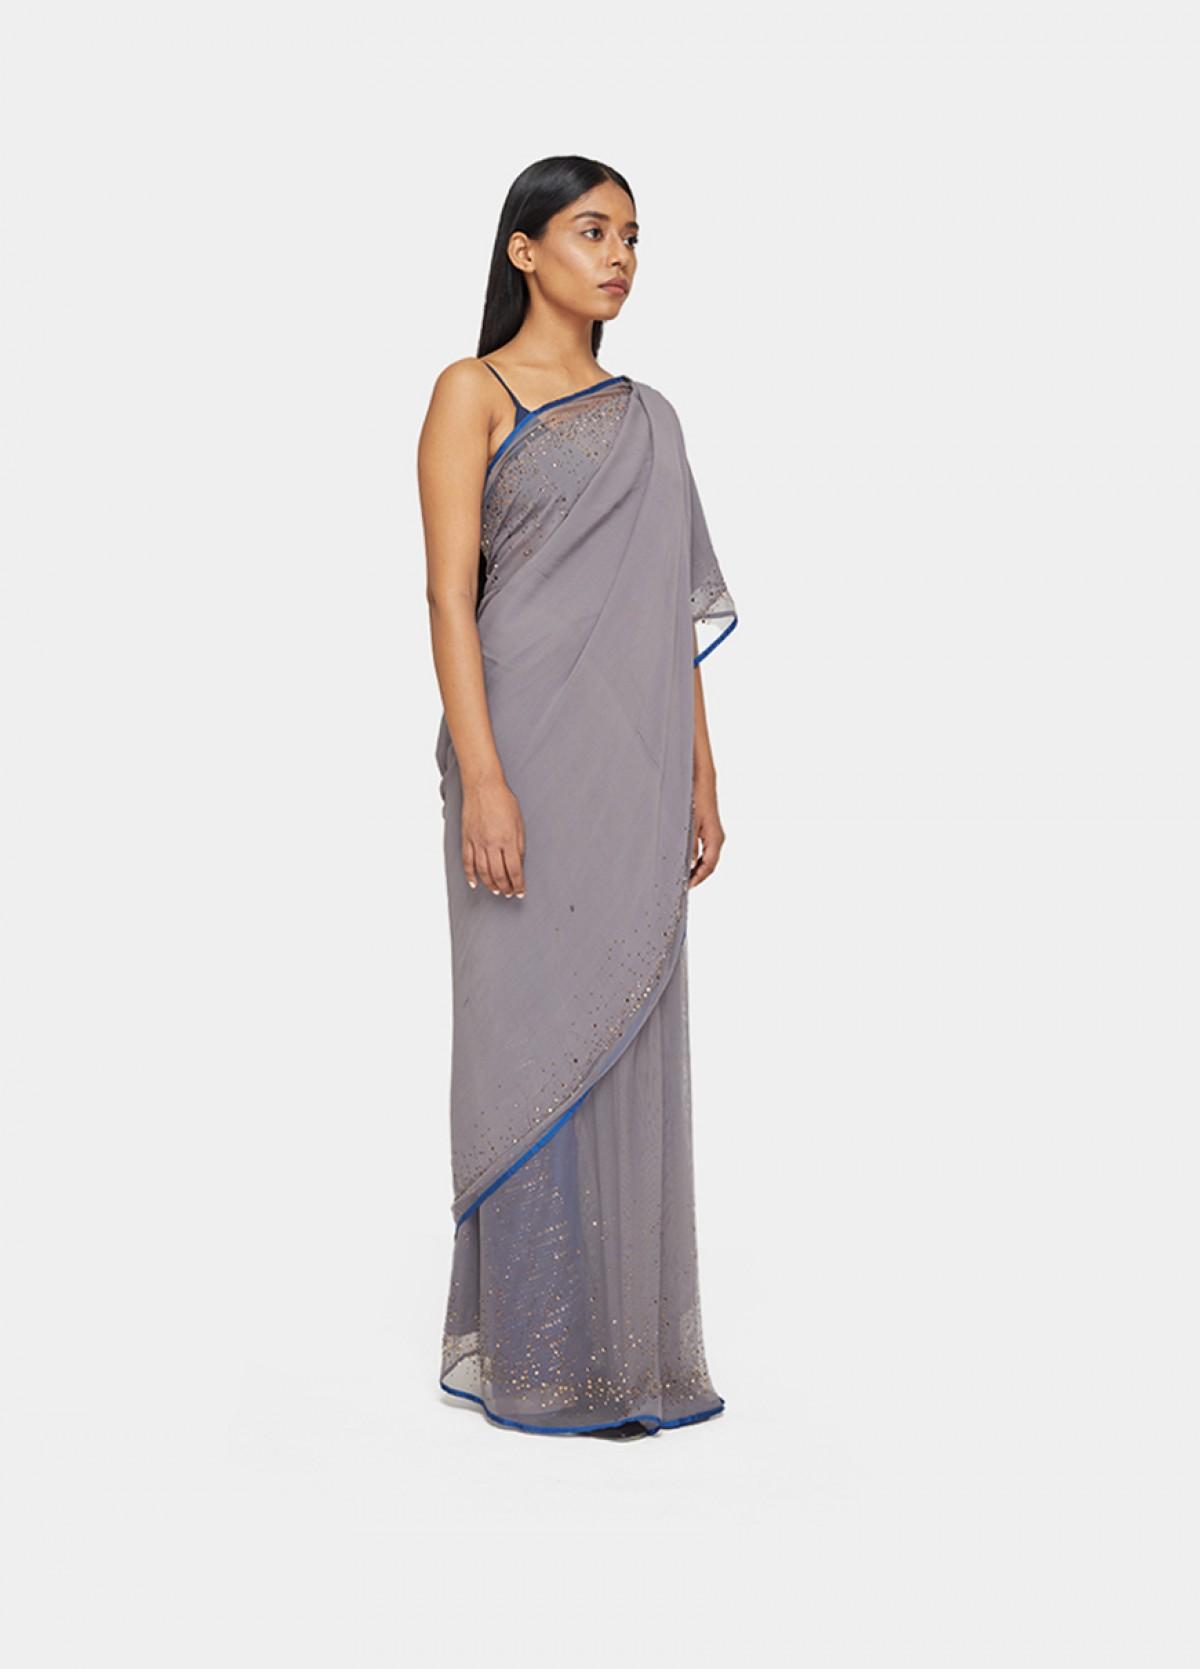 The Mahnorr Sari